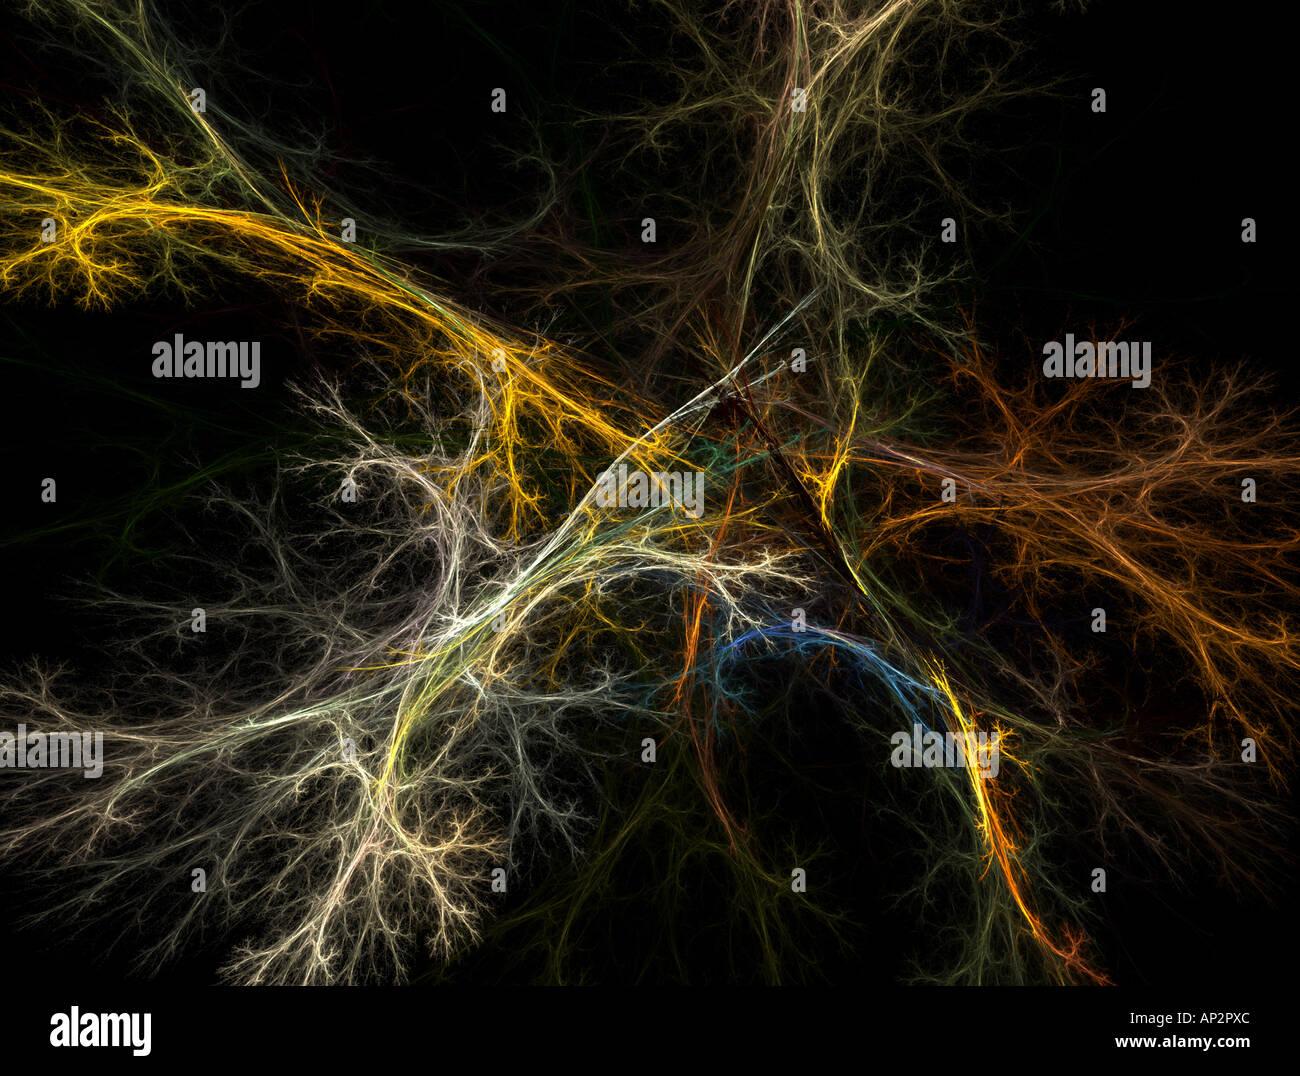 Resumen de la neurona Imagen De Stock